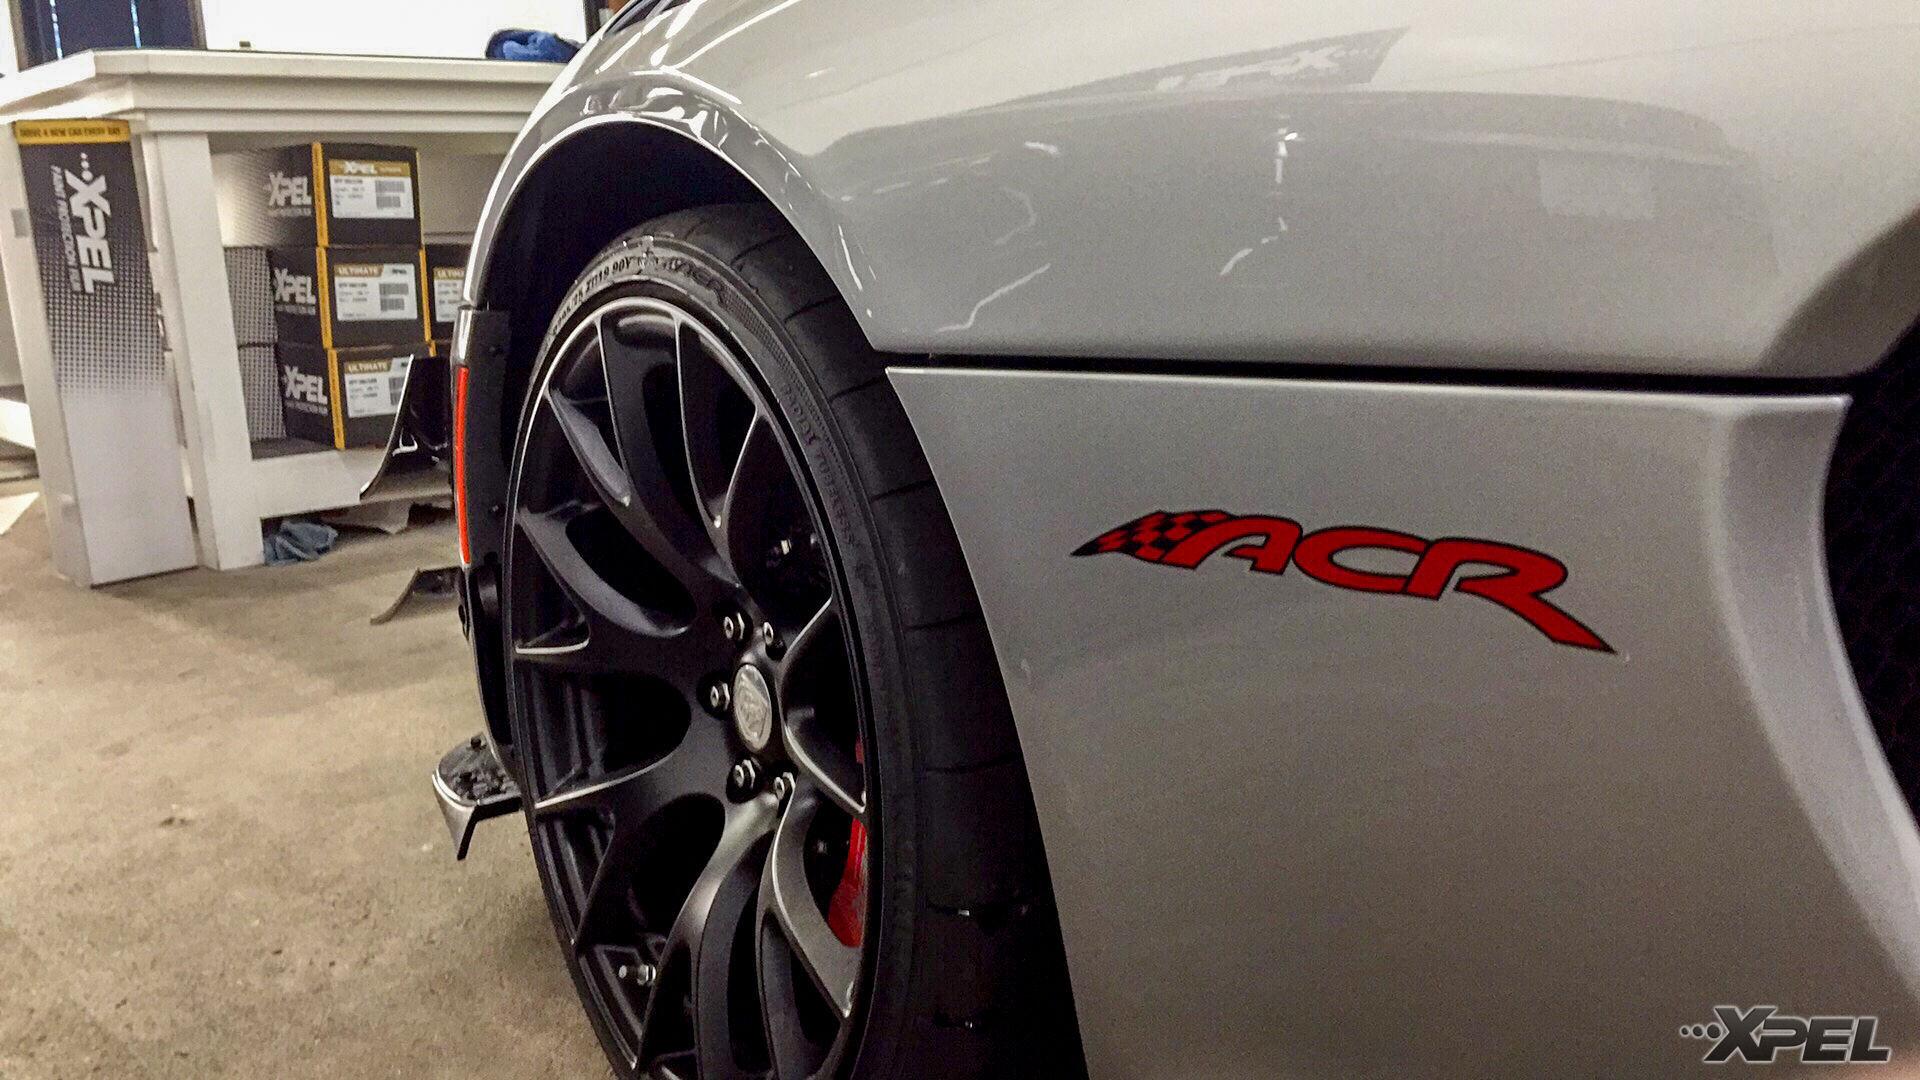 2016 Dodge SRT Viper | ACR Dodge Viper with XPEL ULTIMATE